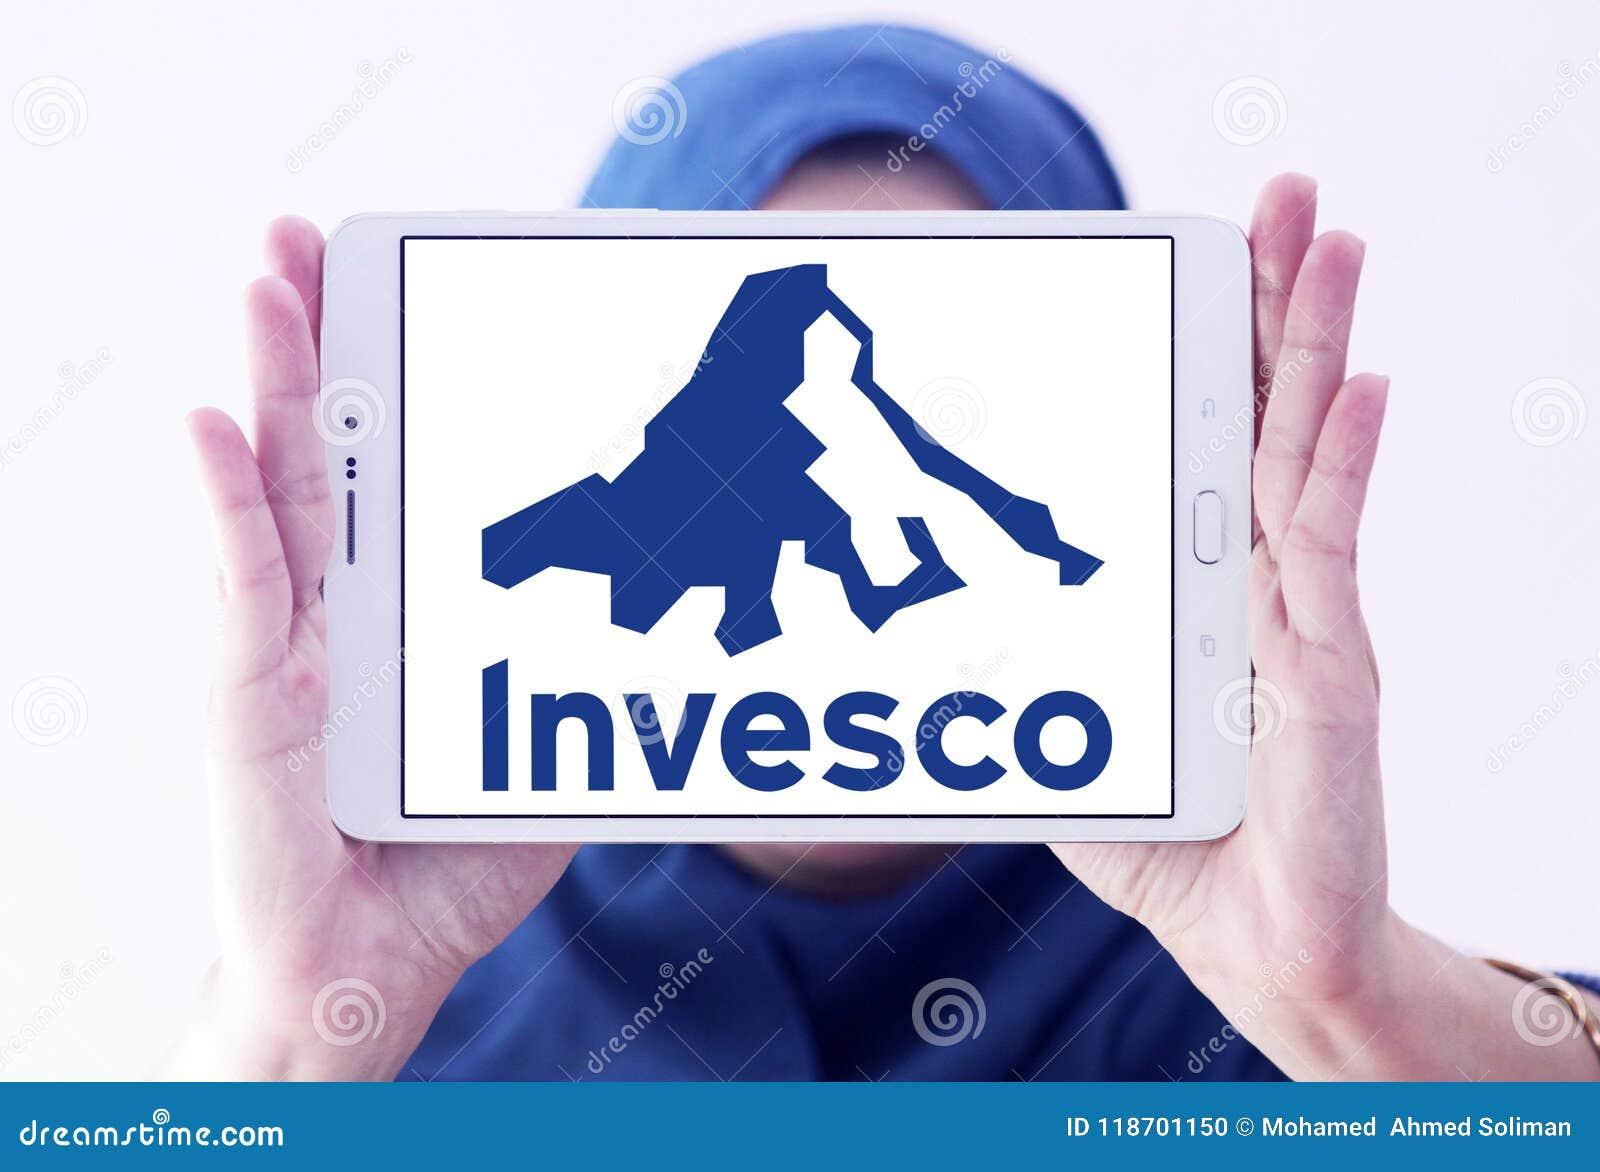 Invesco Investment Management Company Logo Editorial Image Image